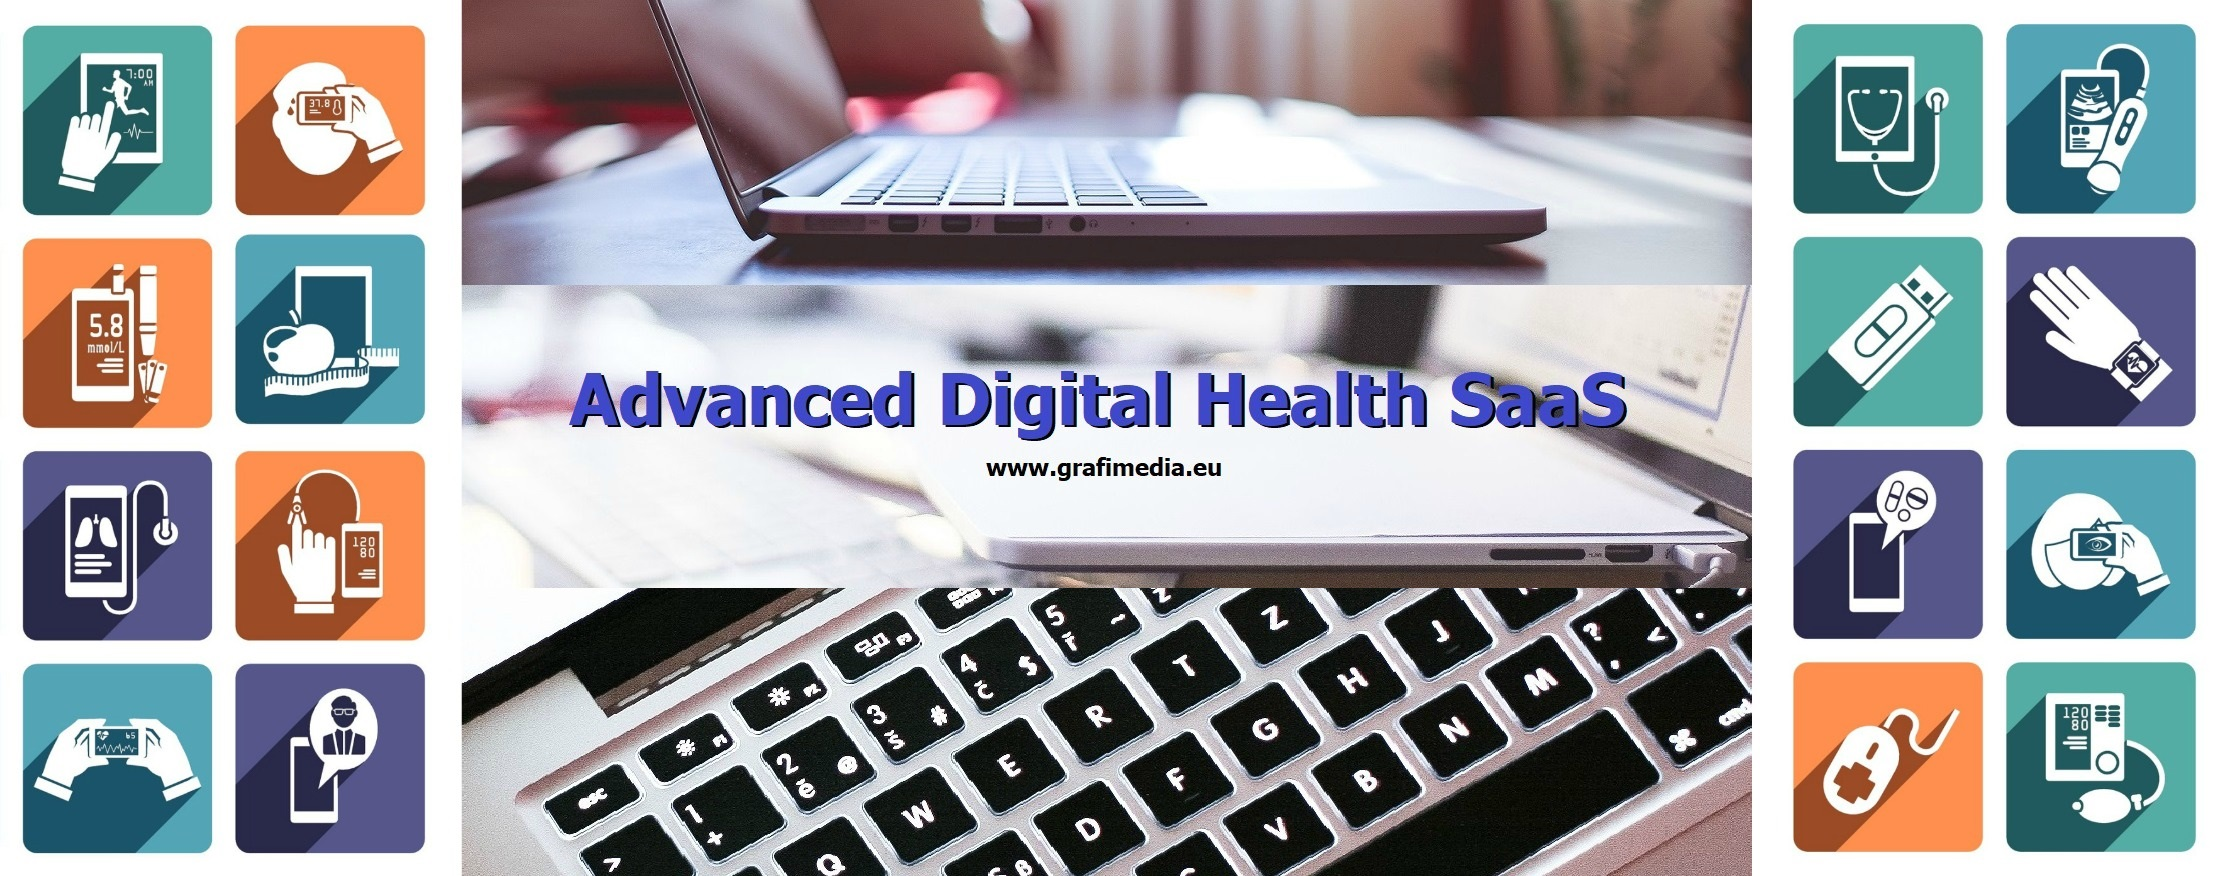 Advanced Digital Health SaaS Grafimedia